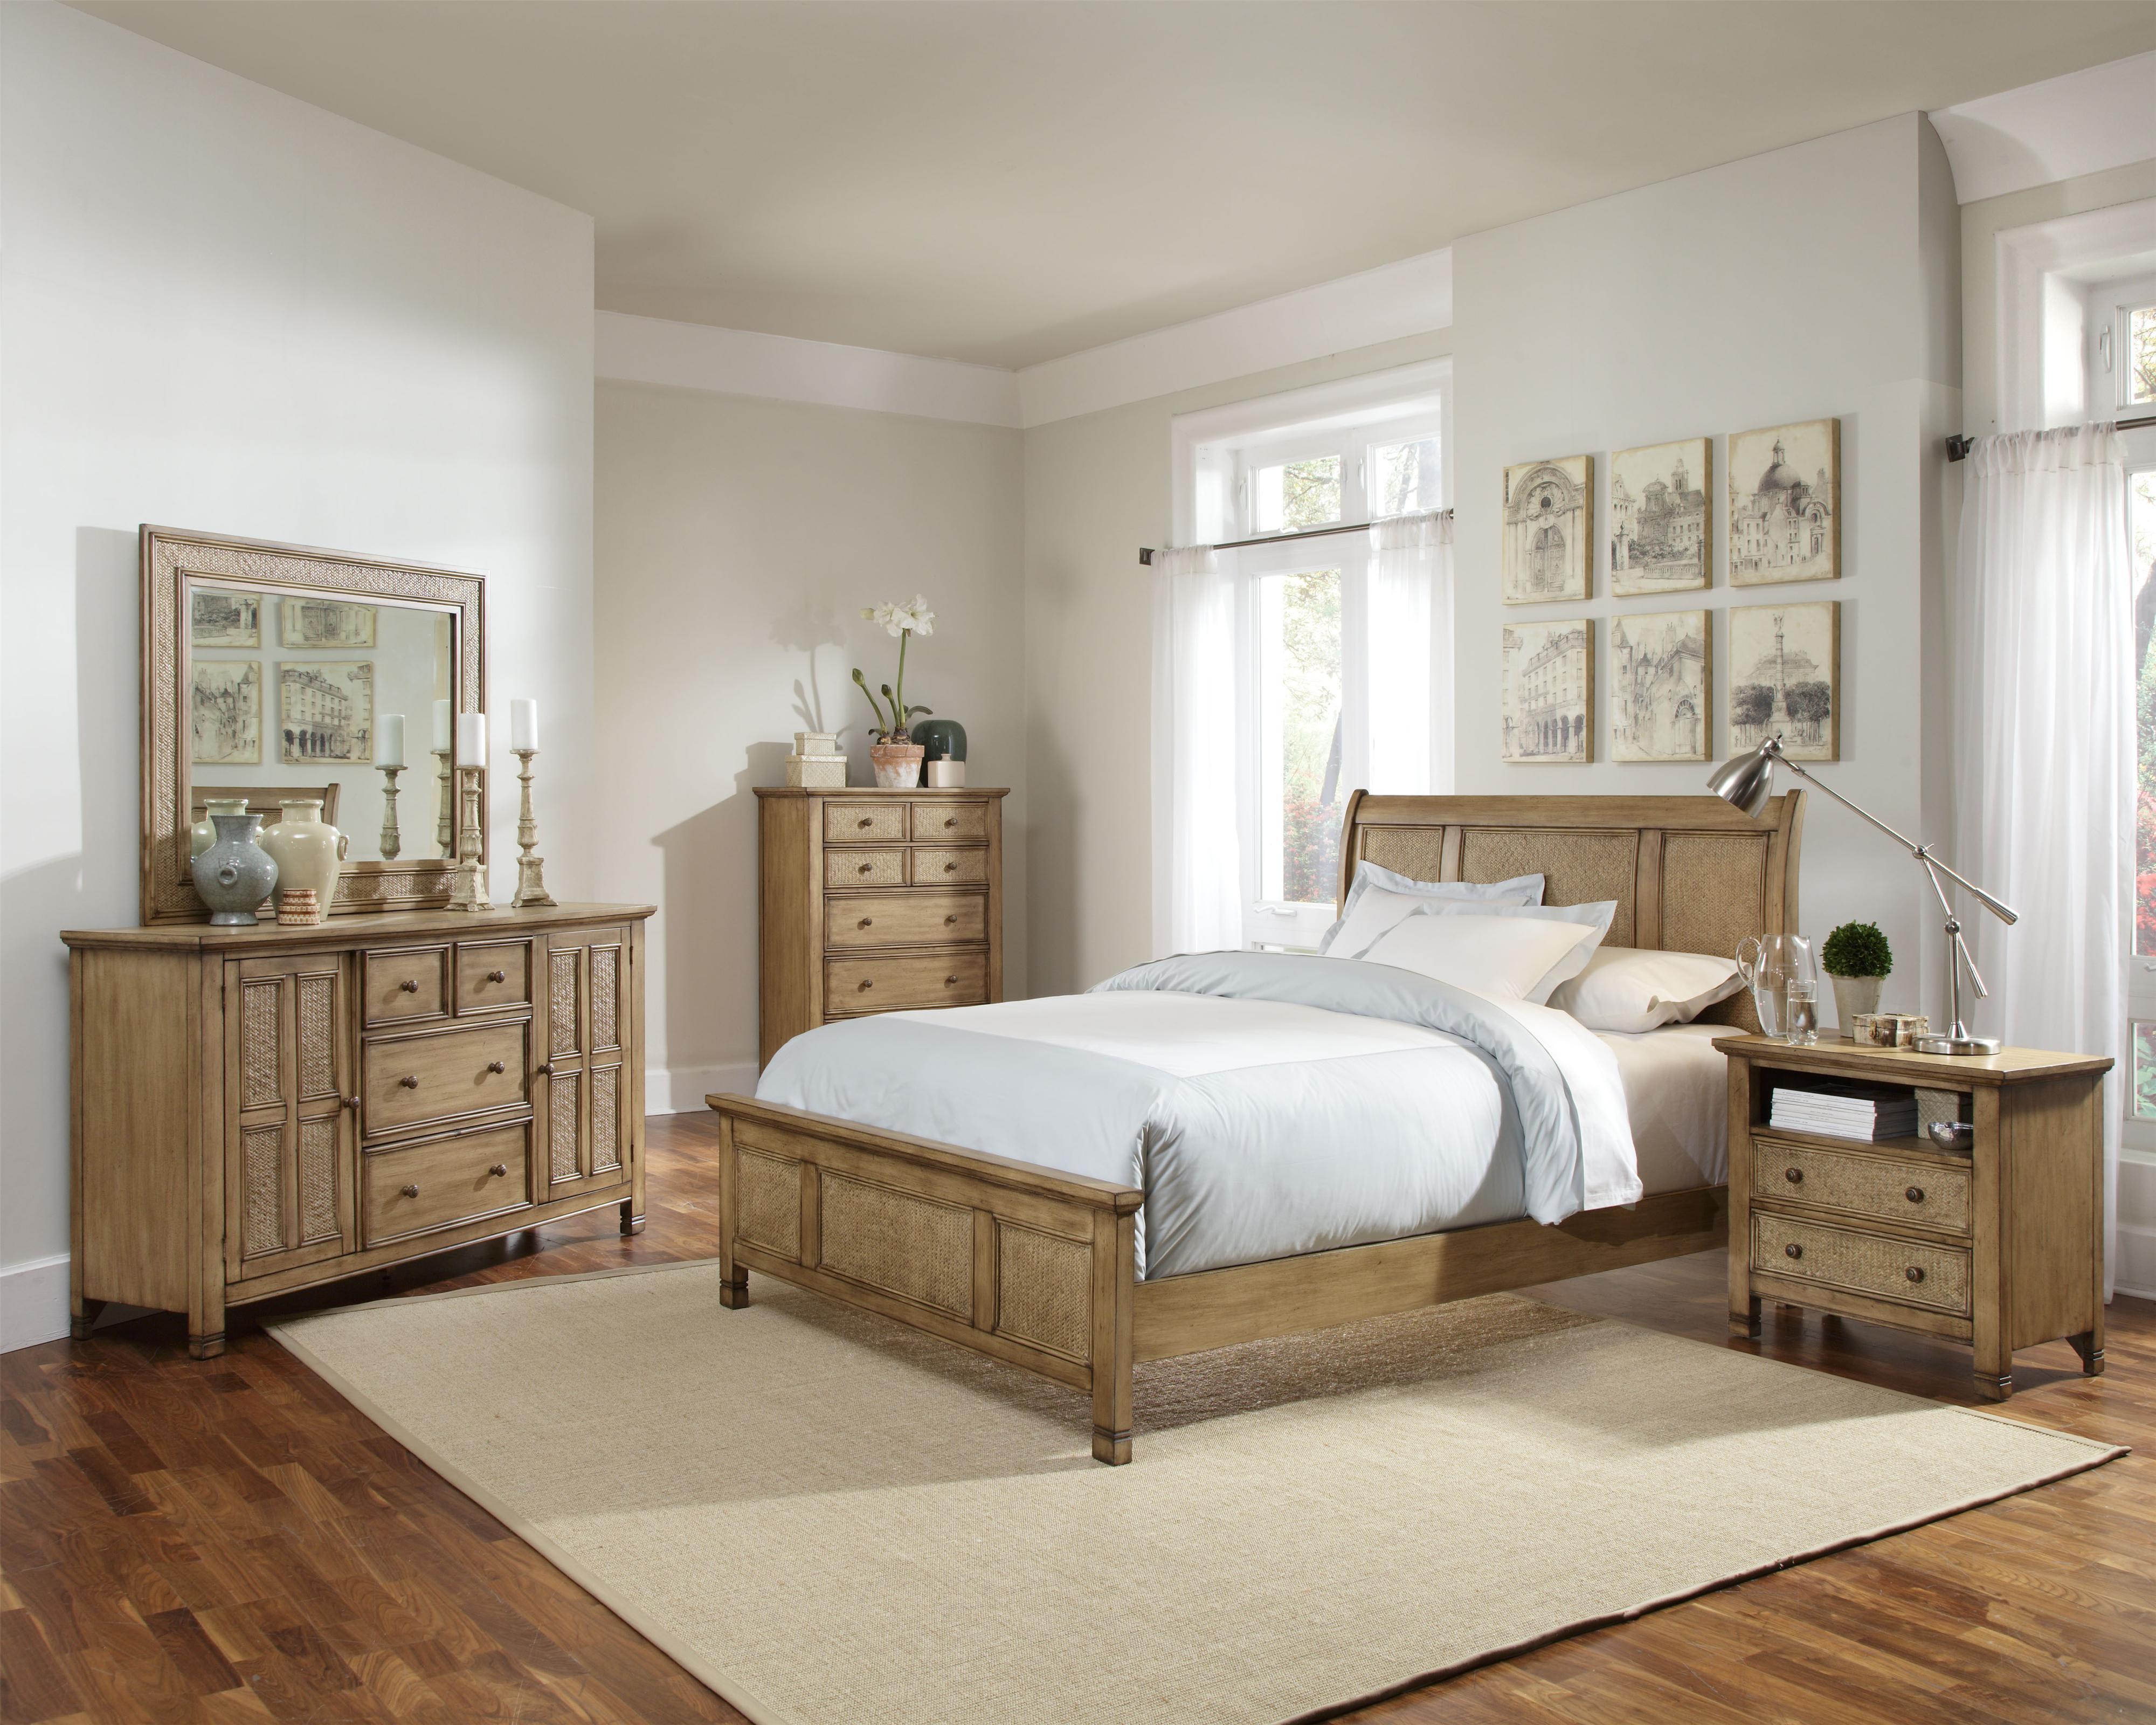 Progressive Furniture Kingston Isle King Bedroom Group Van Hill Furniture Bedroom Groups